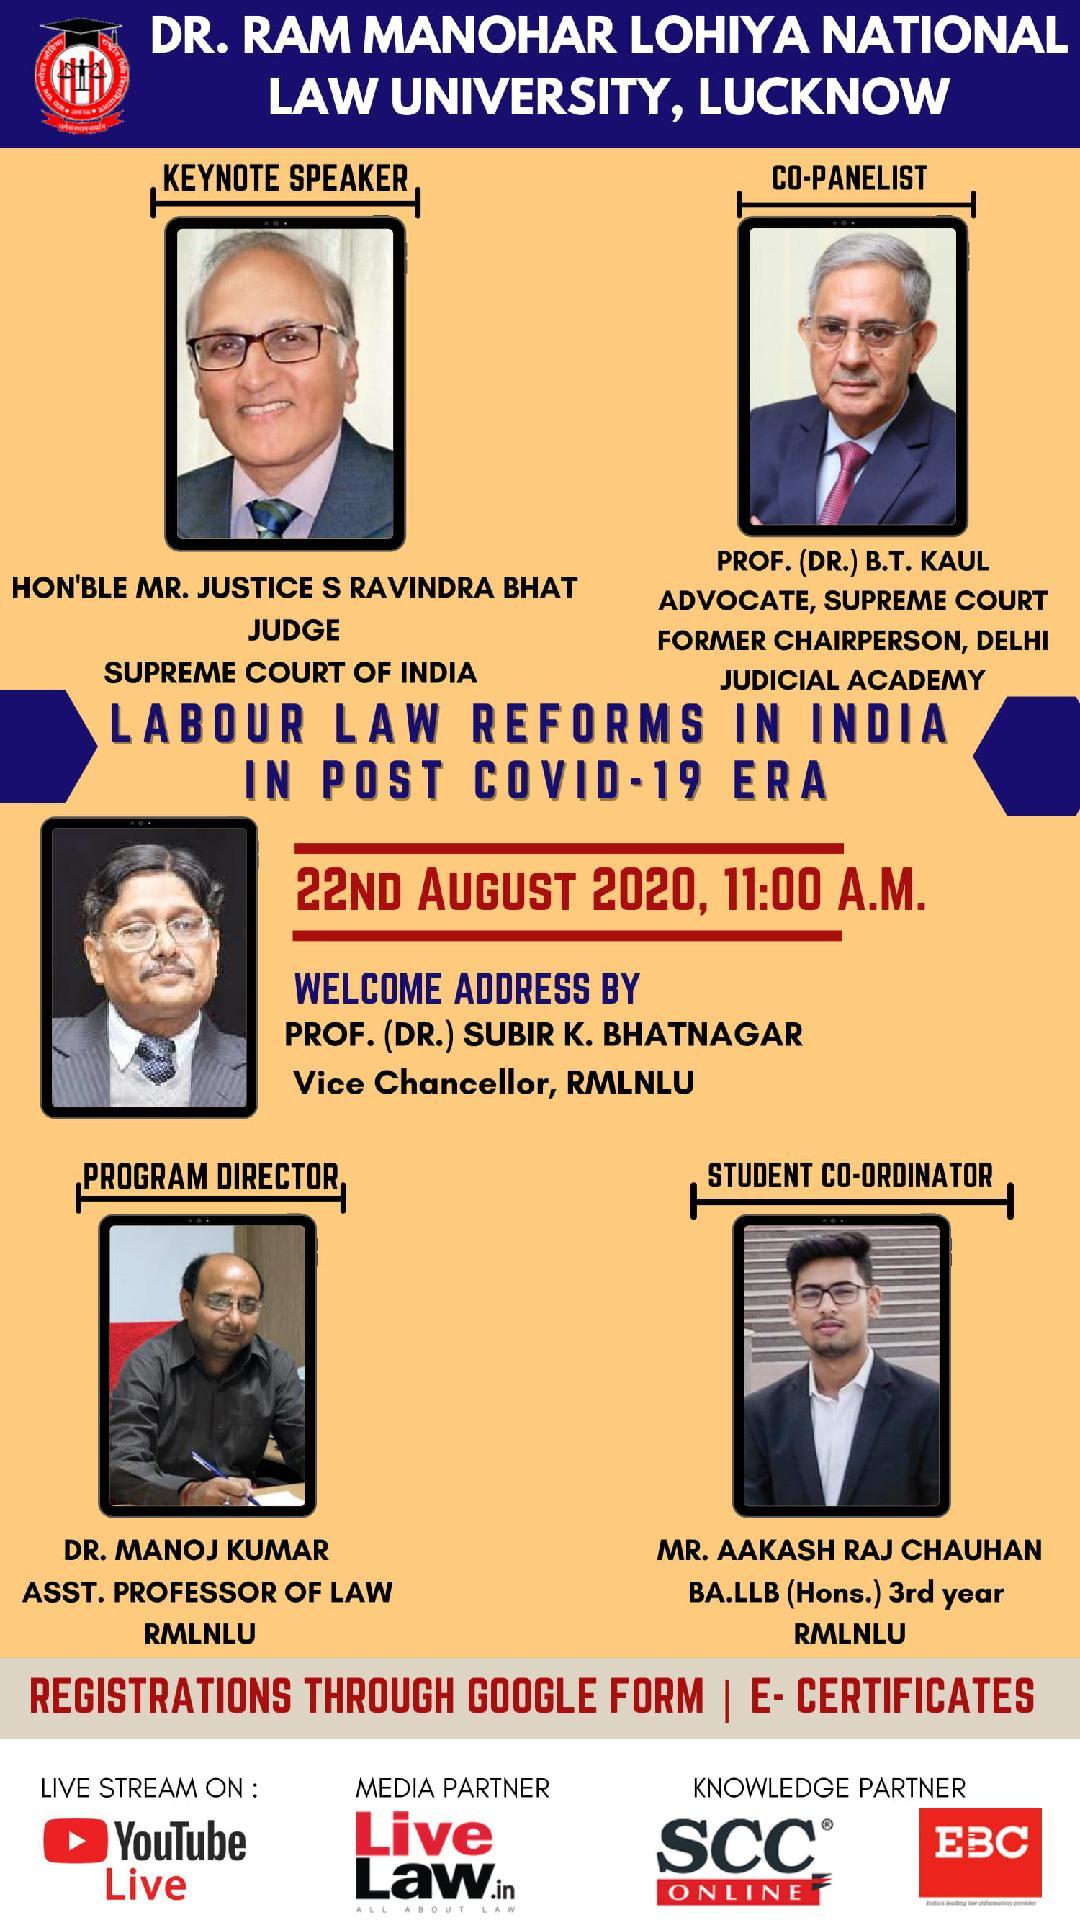 RMLNLU Webinar: Labour Law Reforms Post Covid-19 [22nd Aug]